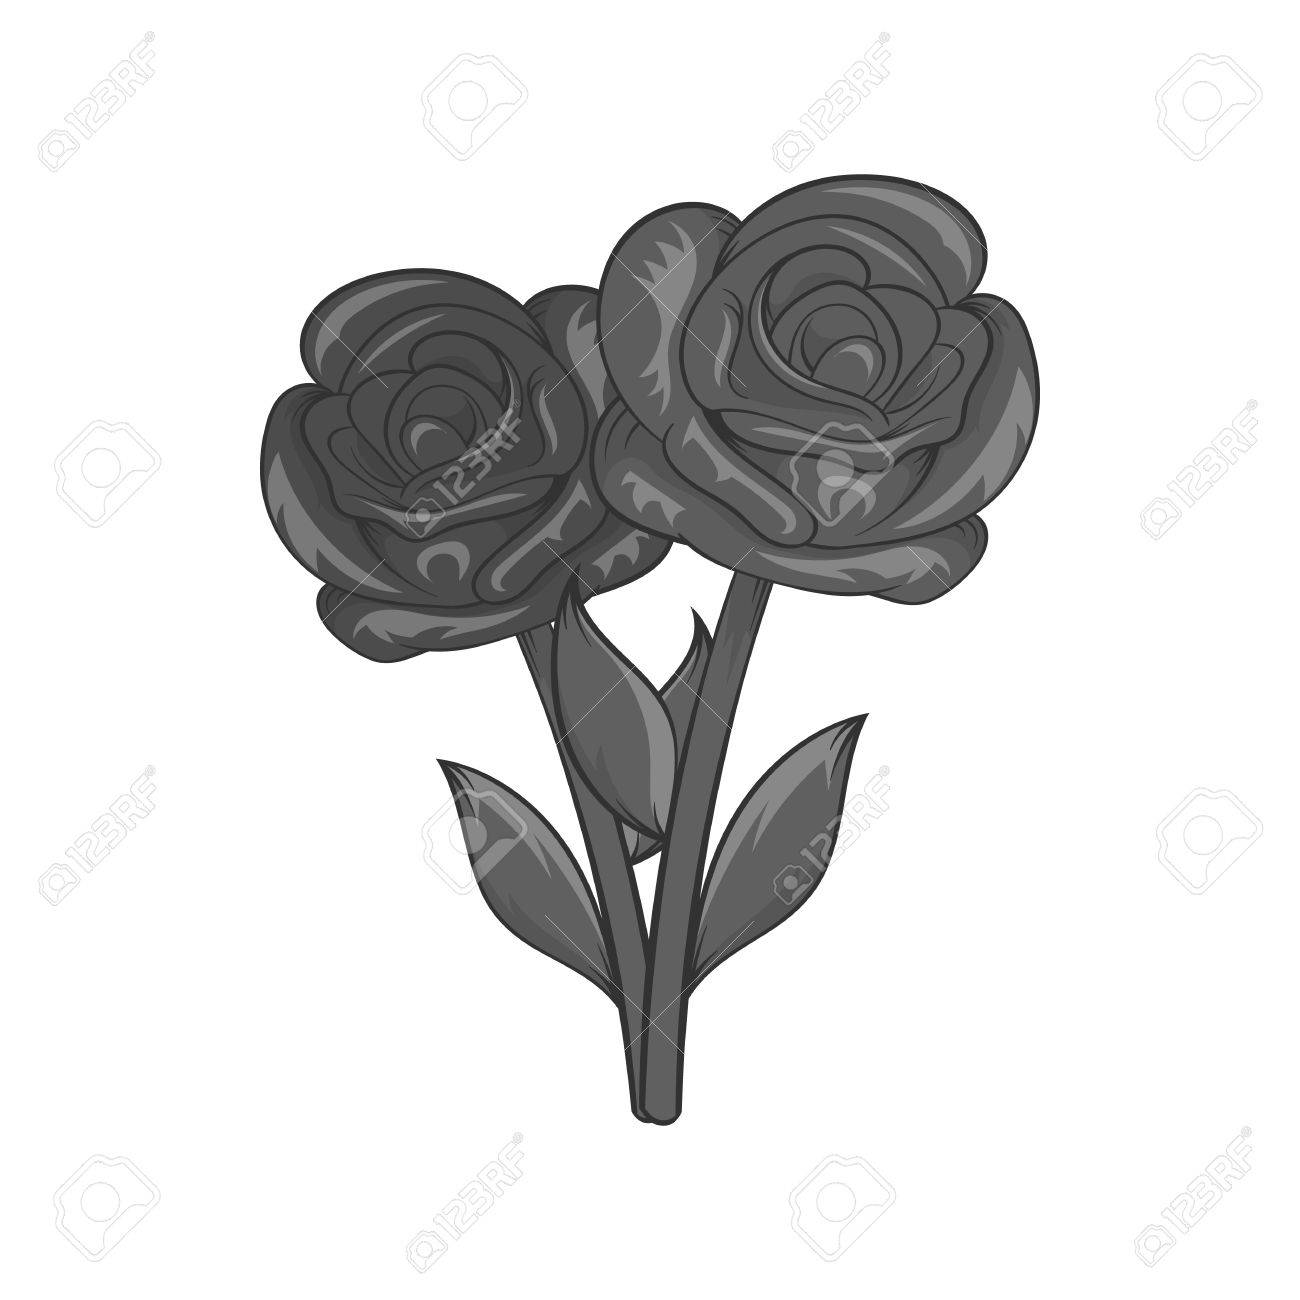 Flowers on grave icon in black monochrome style isolated on white flowers on grave icon in black monochrome style isolated on white background death symbol vector mightylinksfo